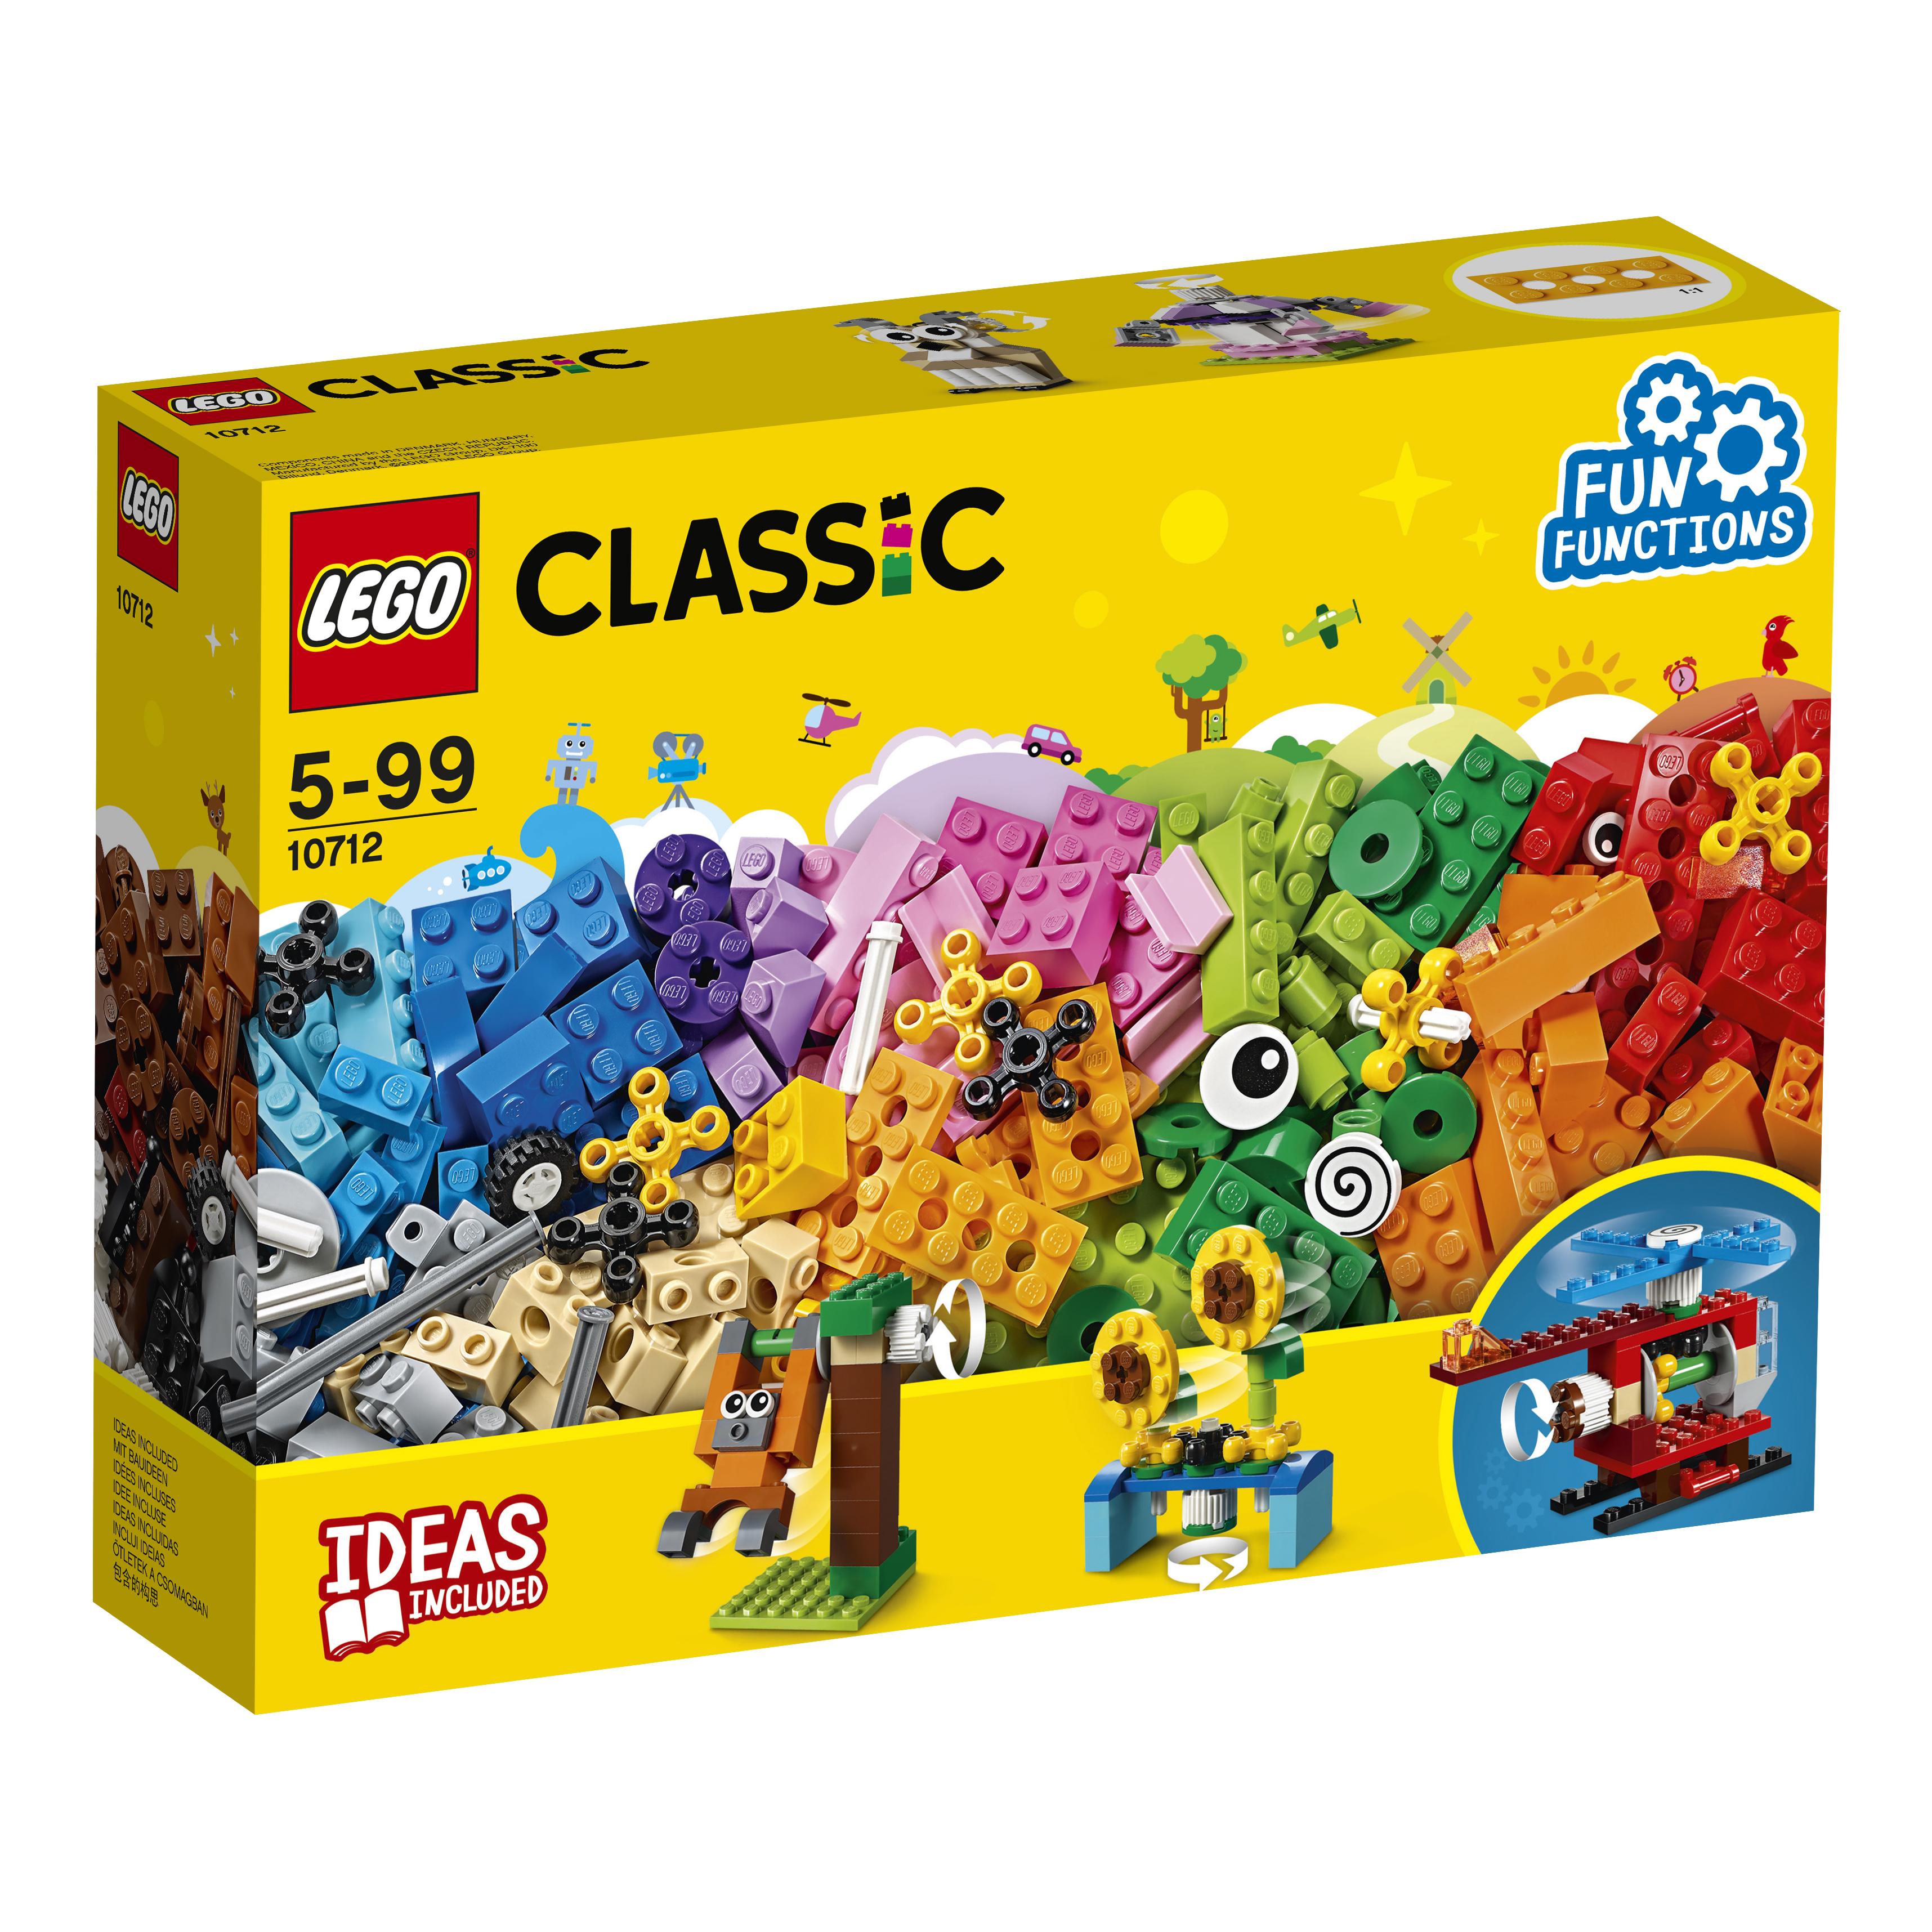 Конструктор LEGO Classic 10712 Кубики и механизмы конструктор lego lego 42057 конструктор сверхлёгкий вертолёт